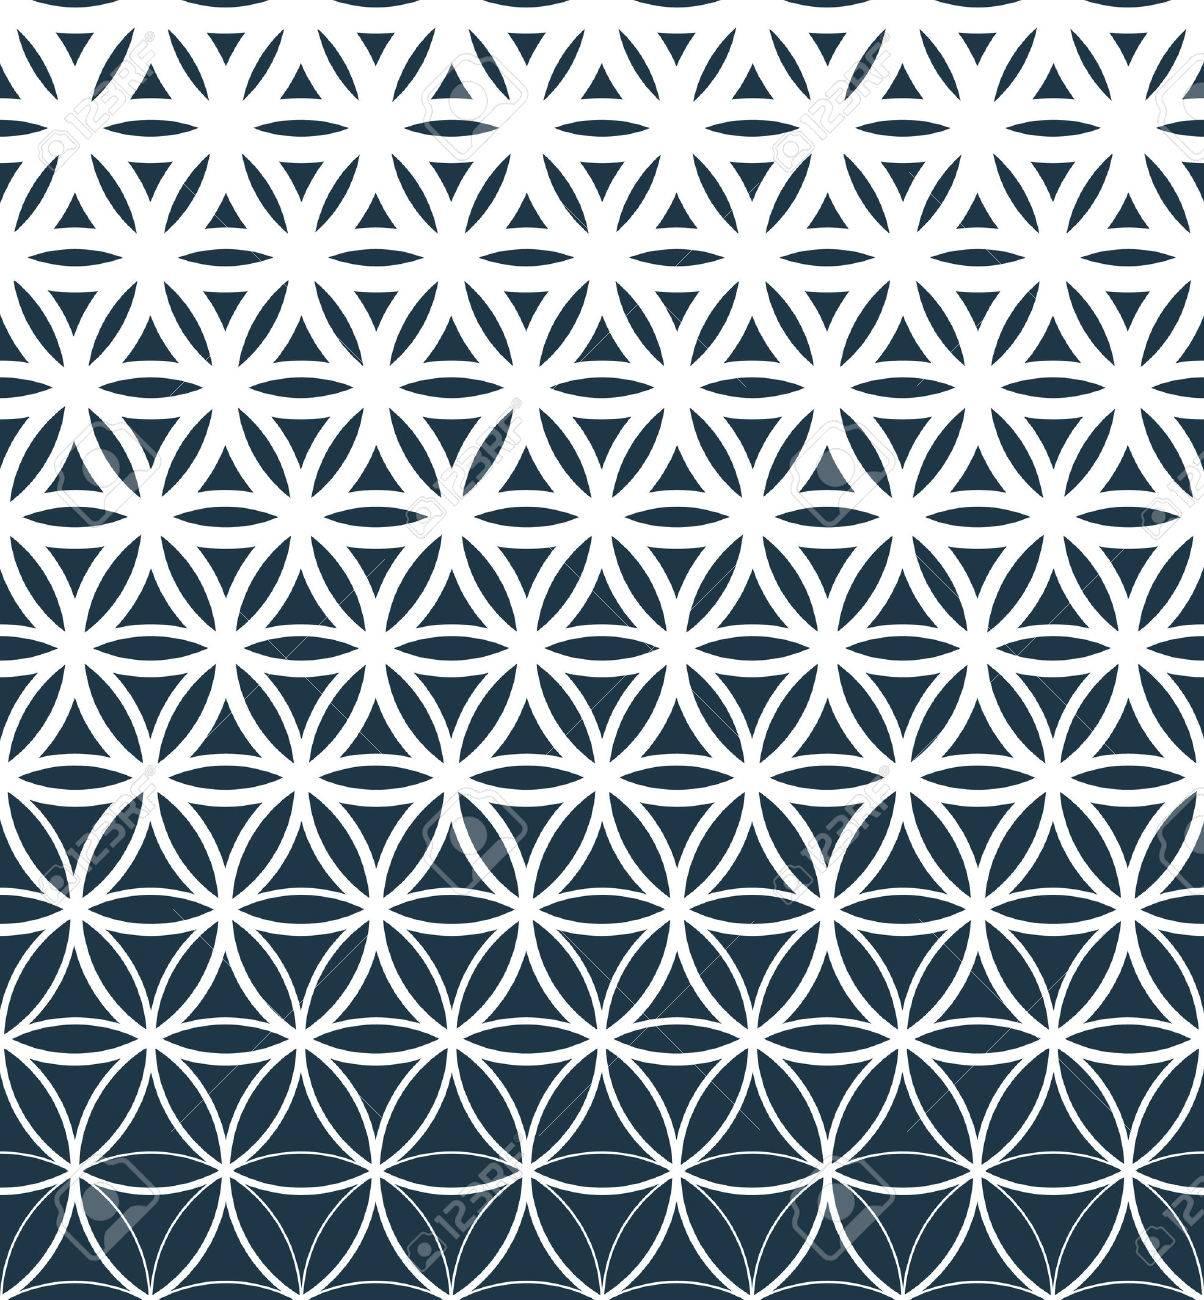 Gradient geometric seamless pattern. - 52776325